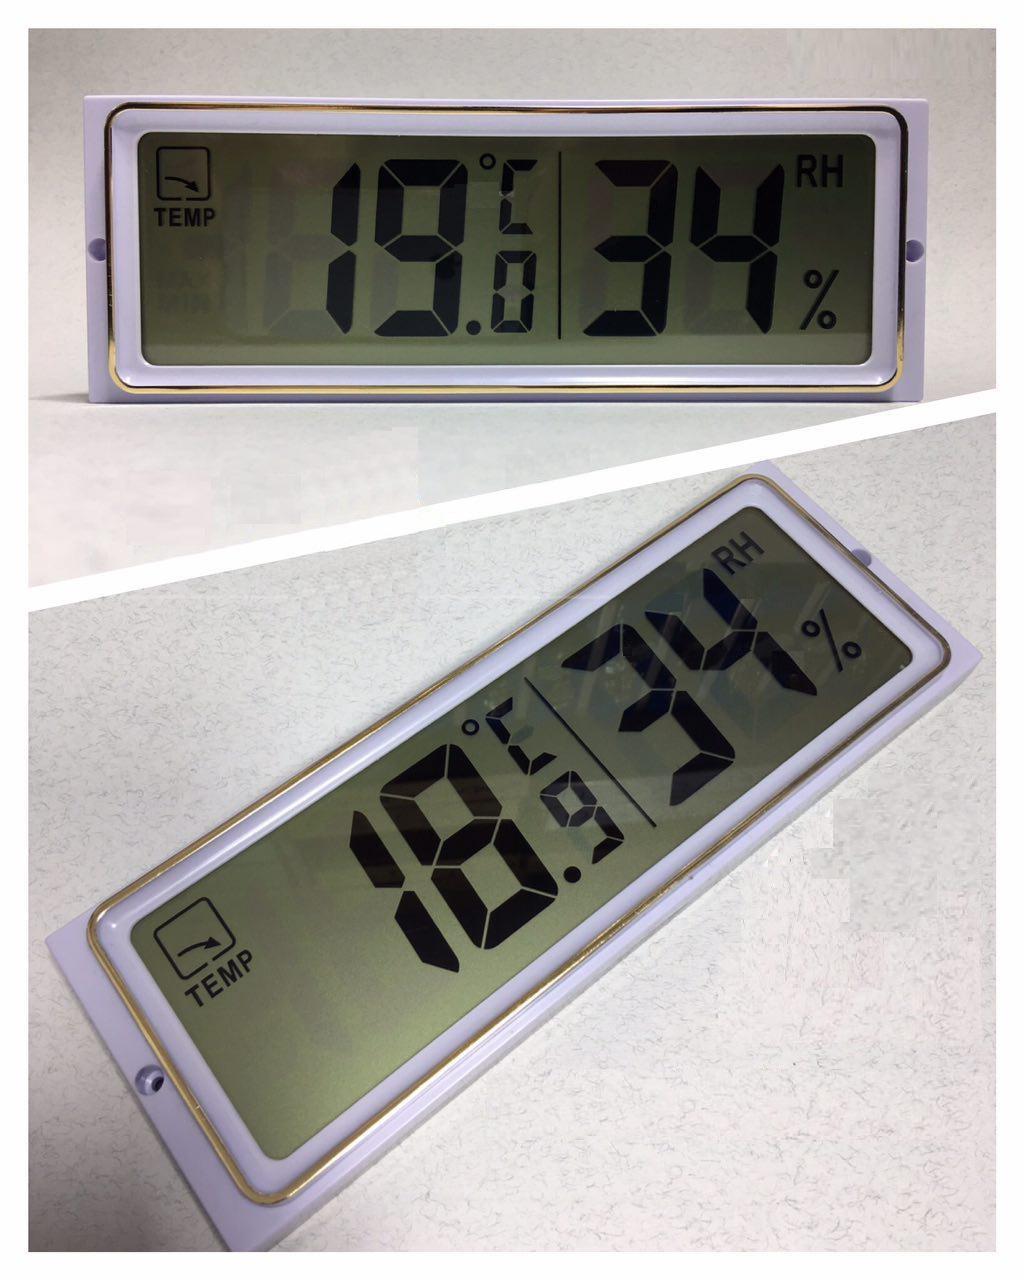 ساعت رومیزی دیجیتال